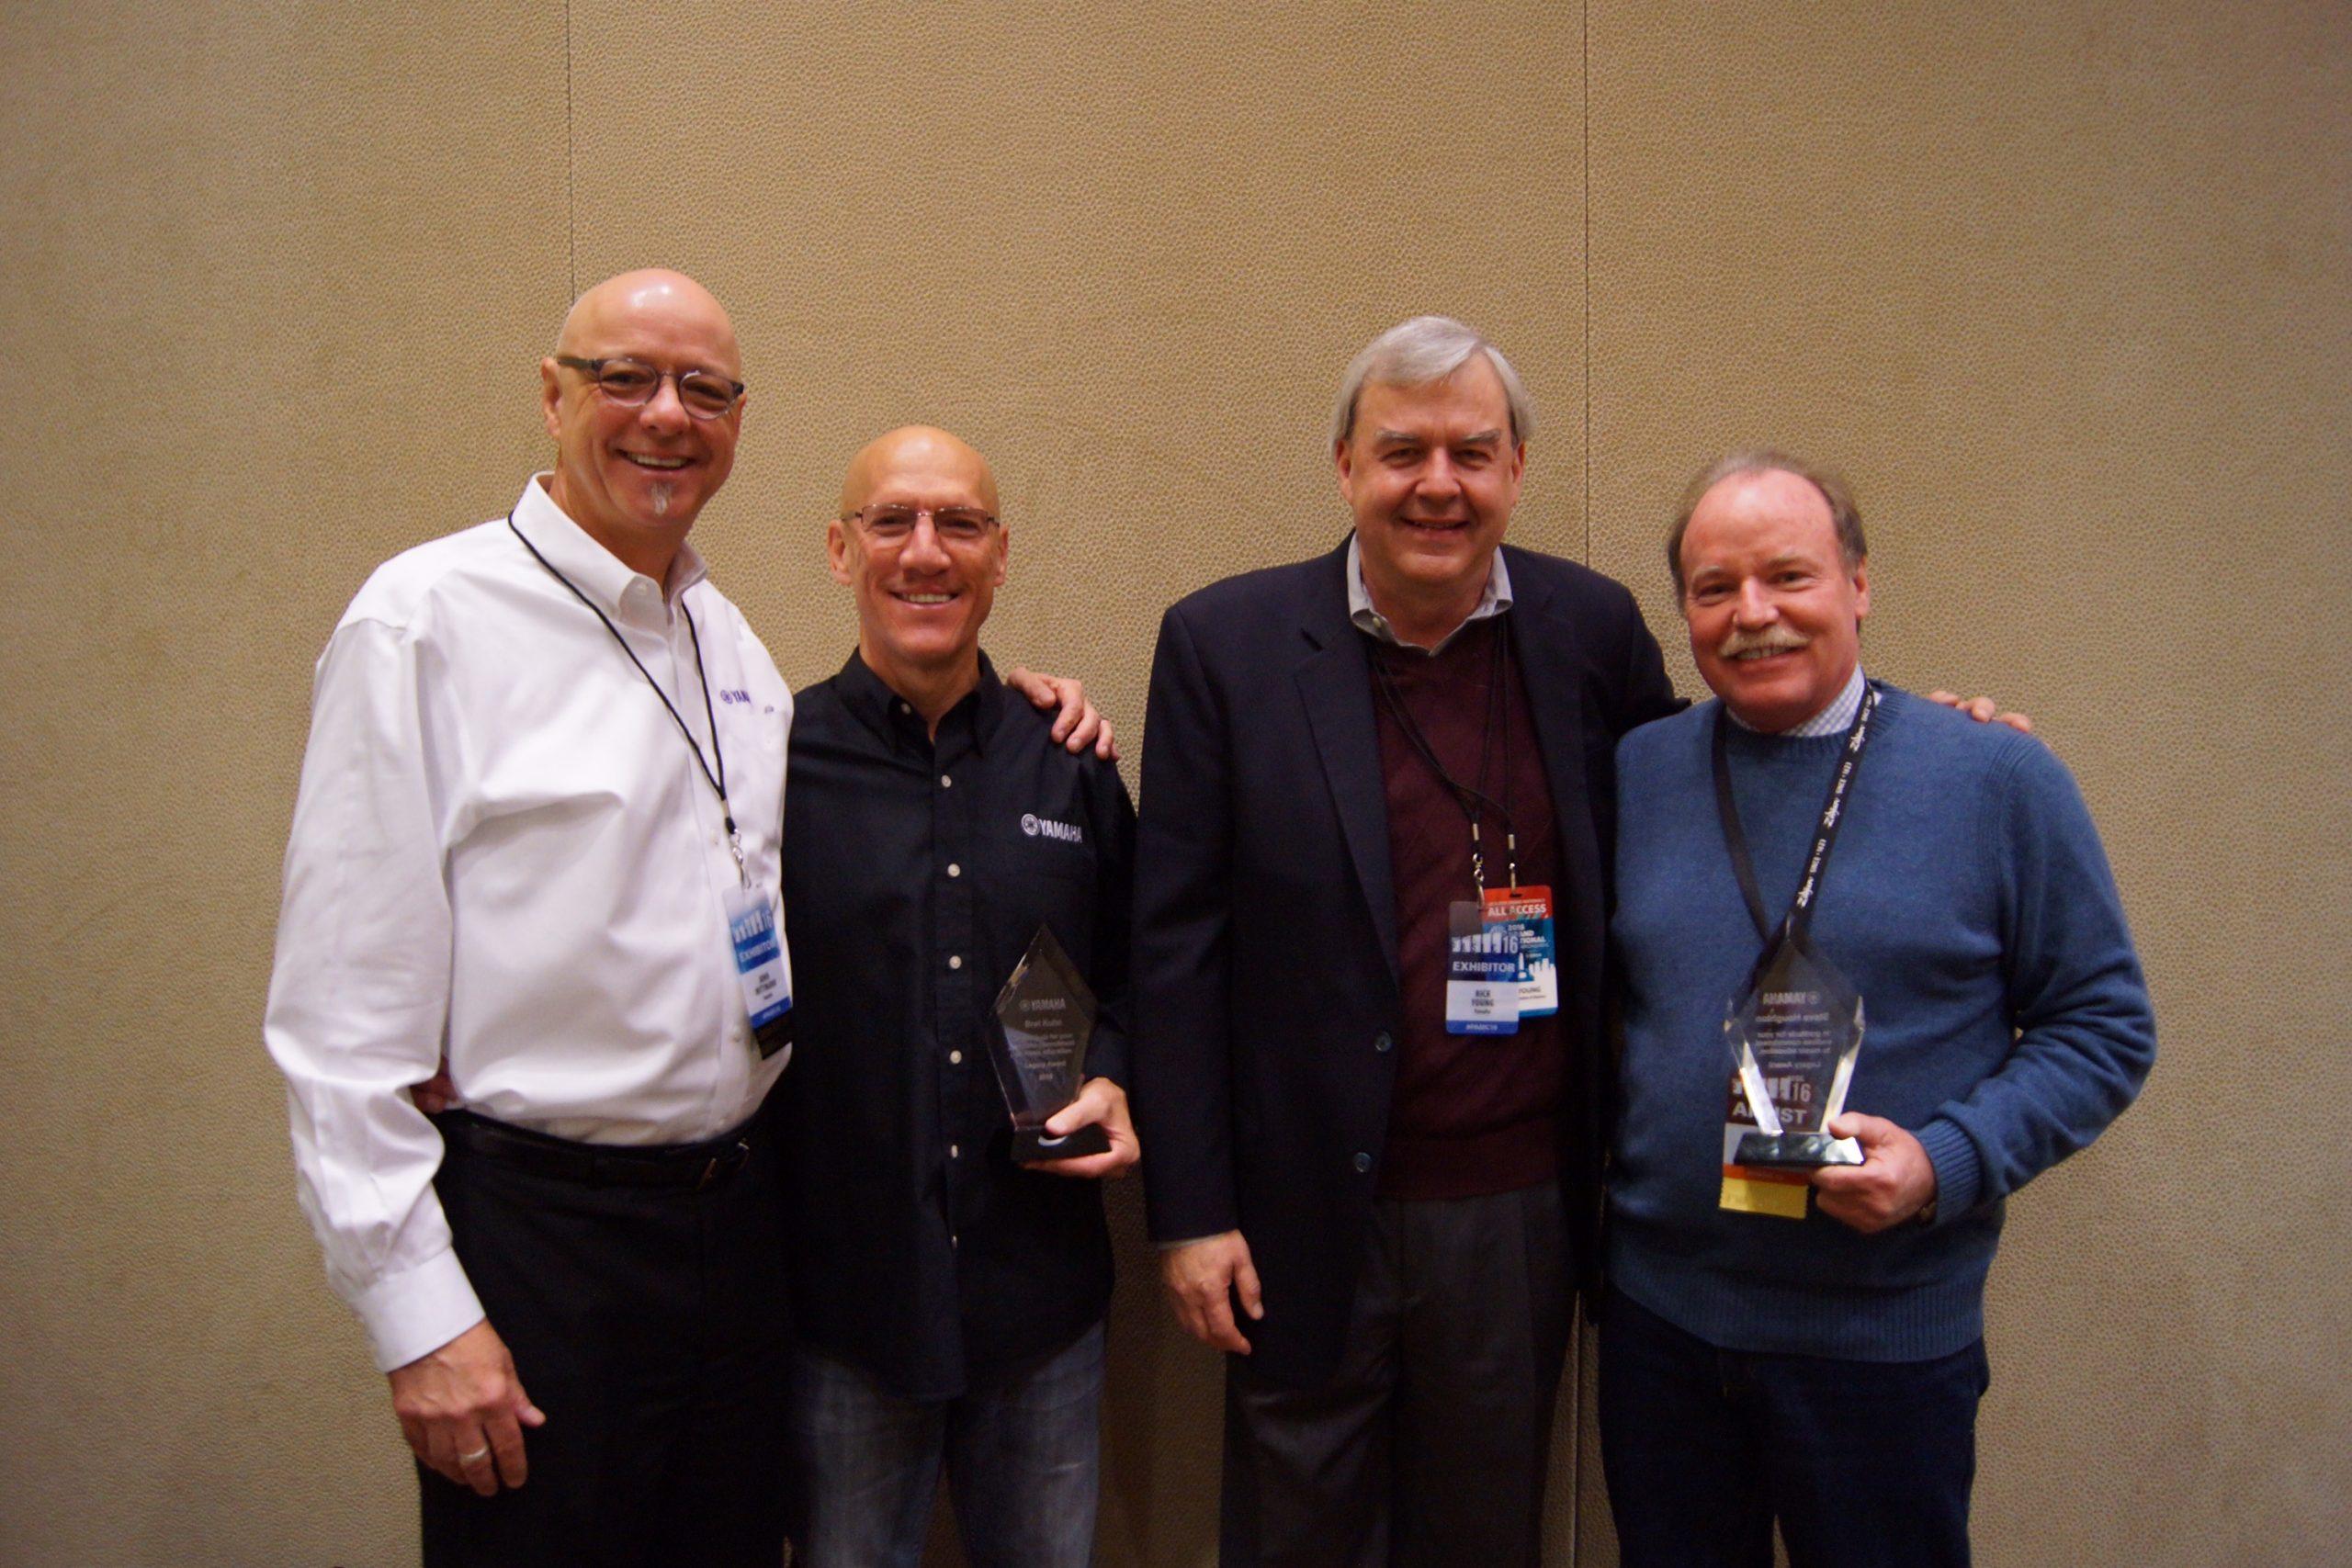 From left: John Wittmann, director, Artist Relations and Education, Yamaha; Legacy in Education Award winner Bret Kuhn; Rick Young, SVP, Yamaha; Legacy in Education Award winner Steve Houghton.